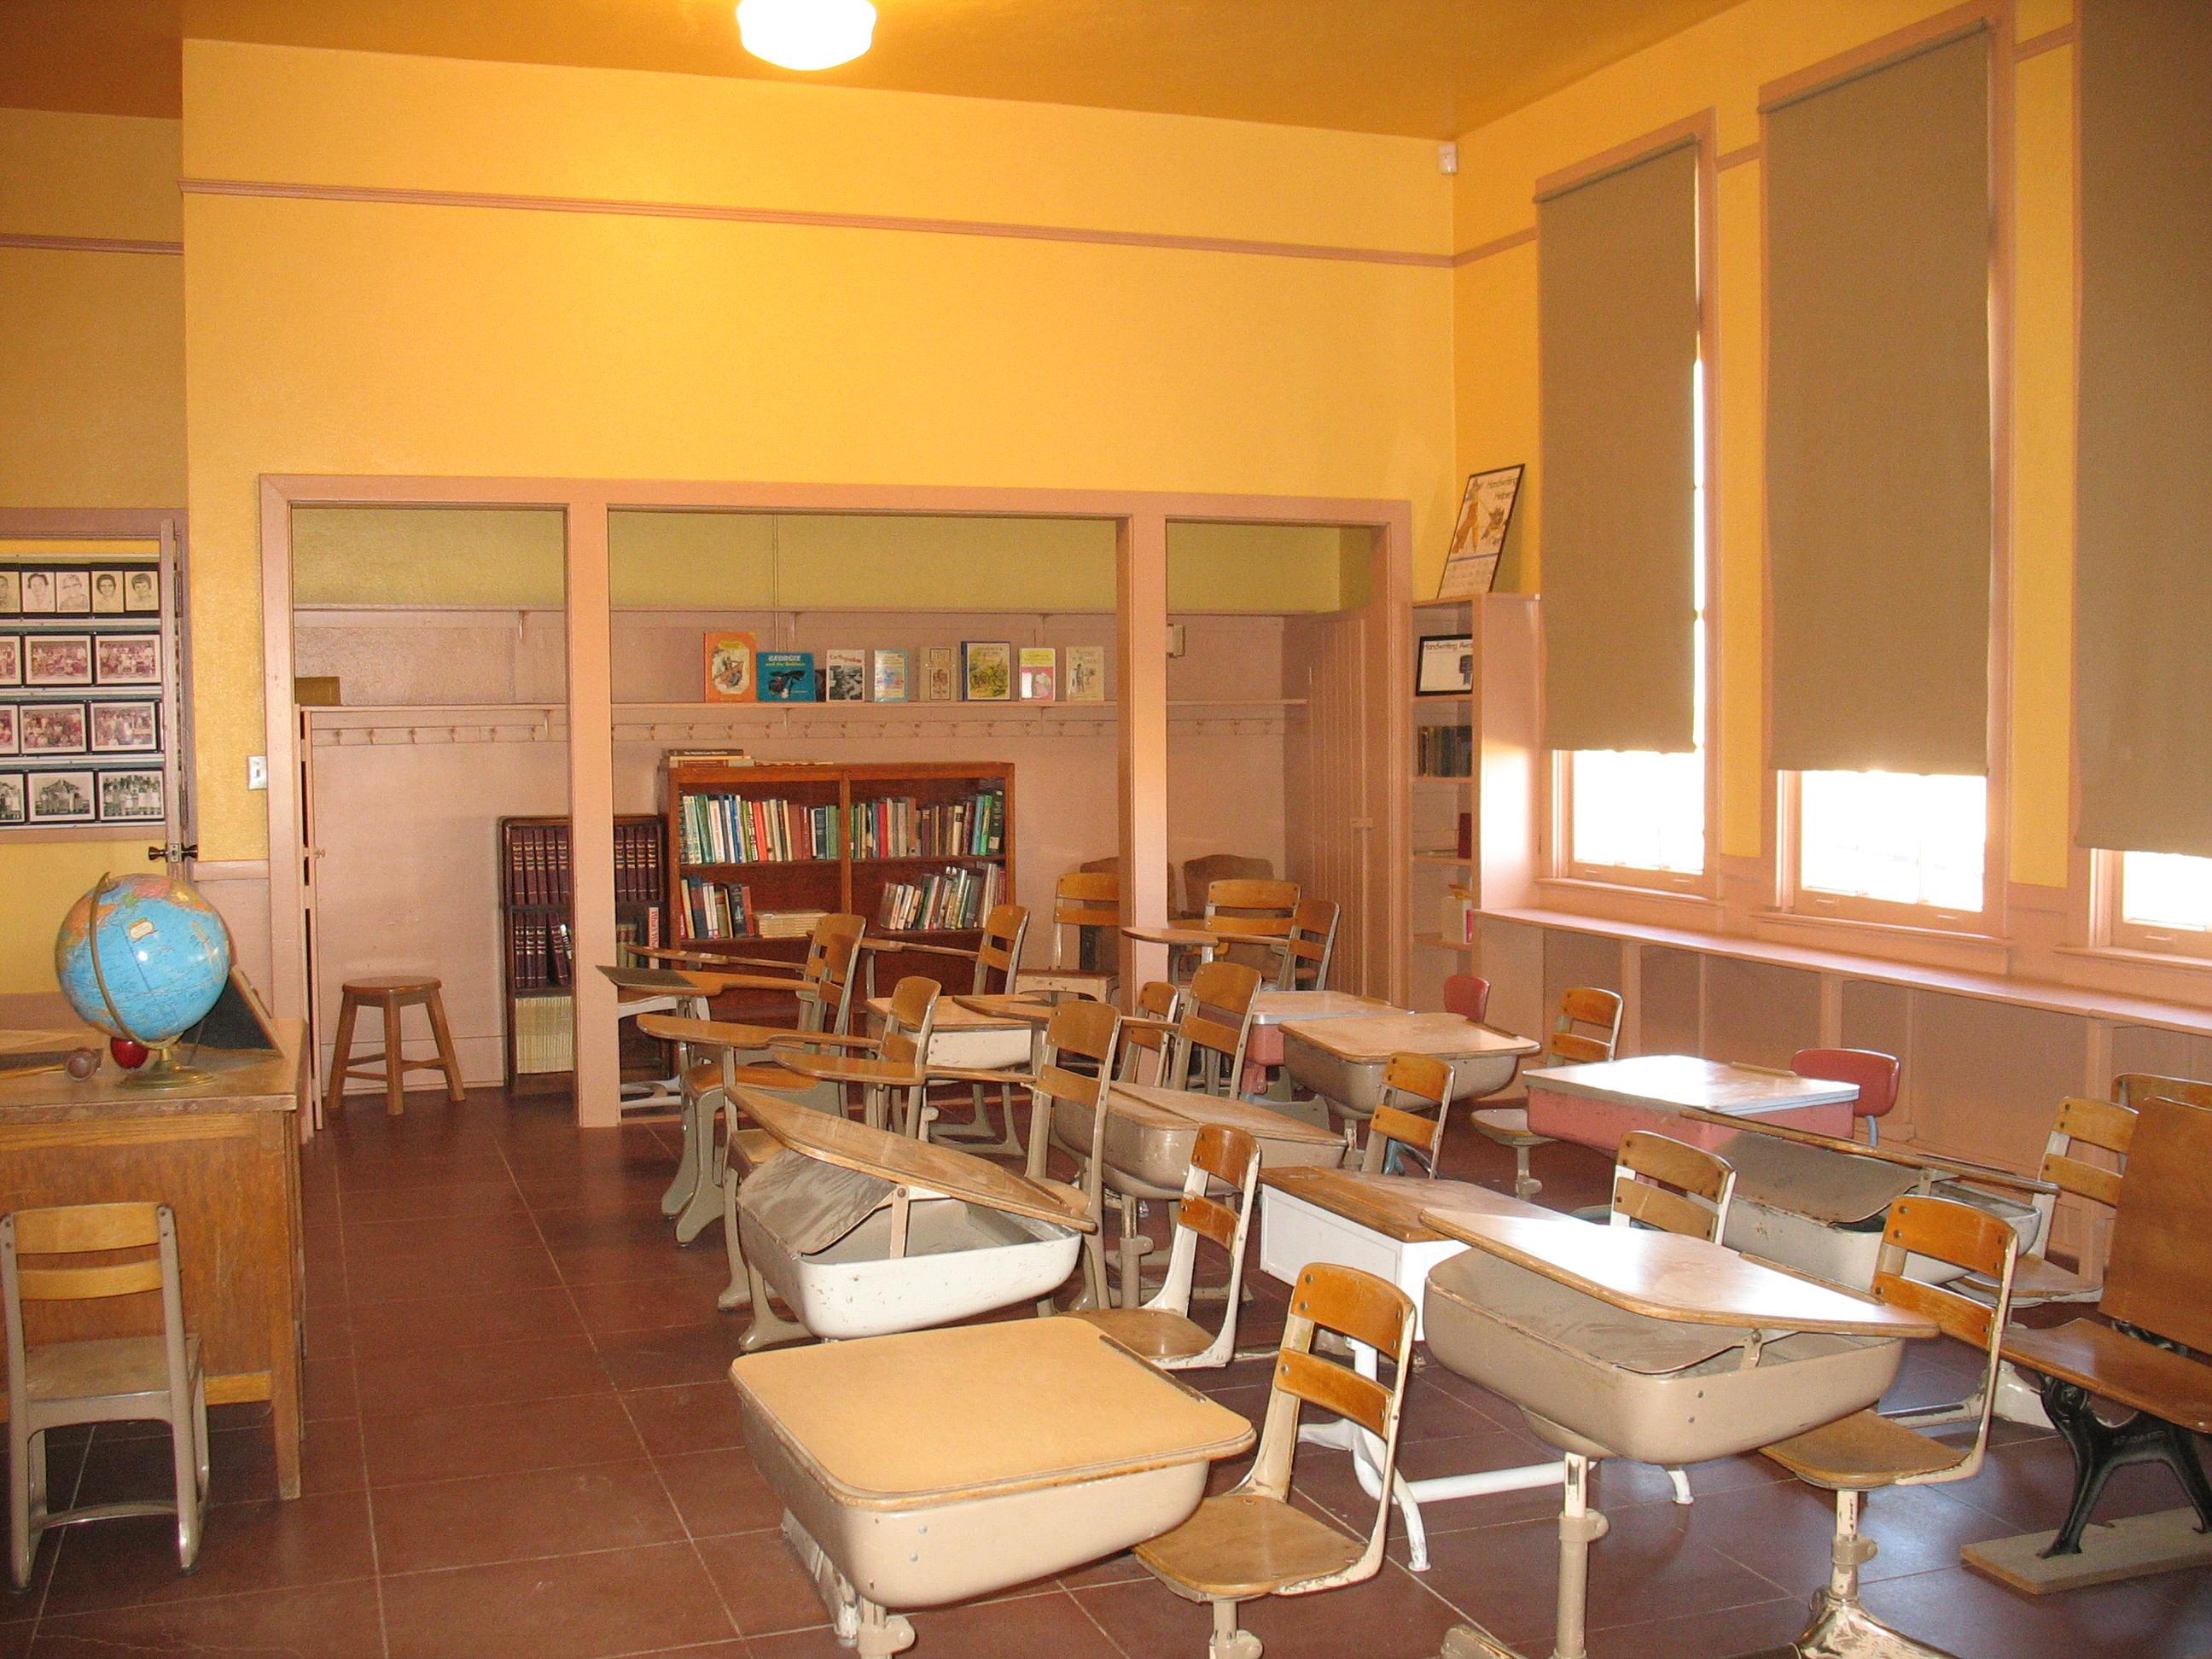 Elementary School Classrooms ~ File rittenhouse elementary school classroom g